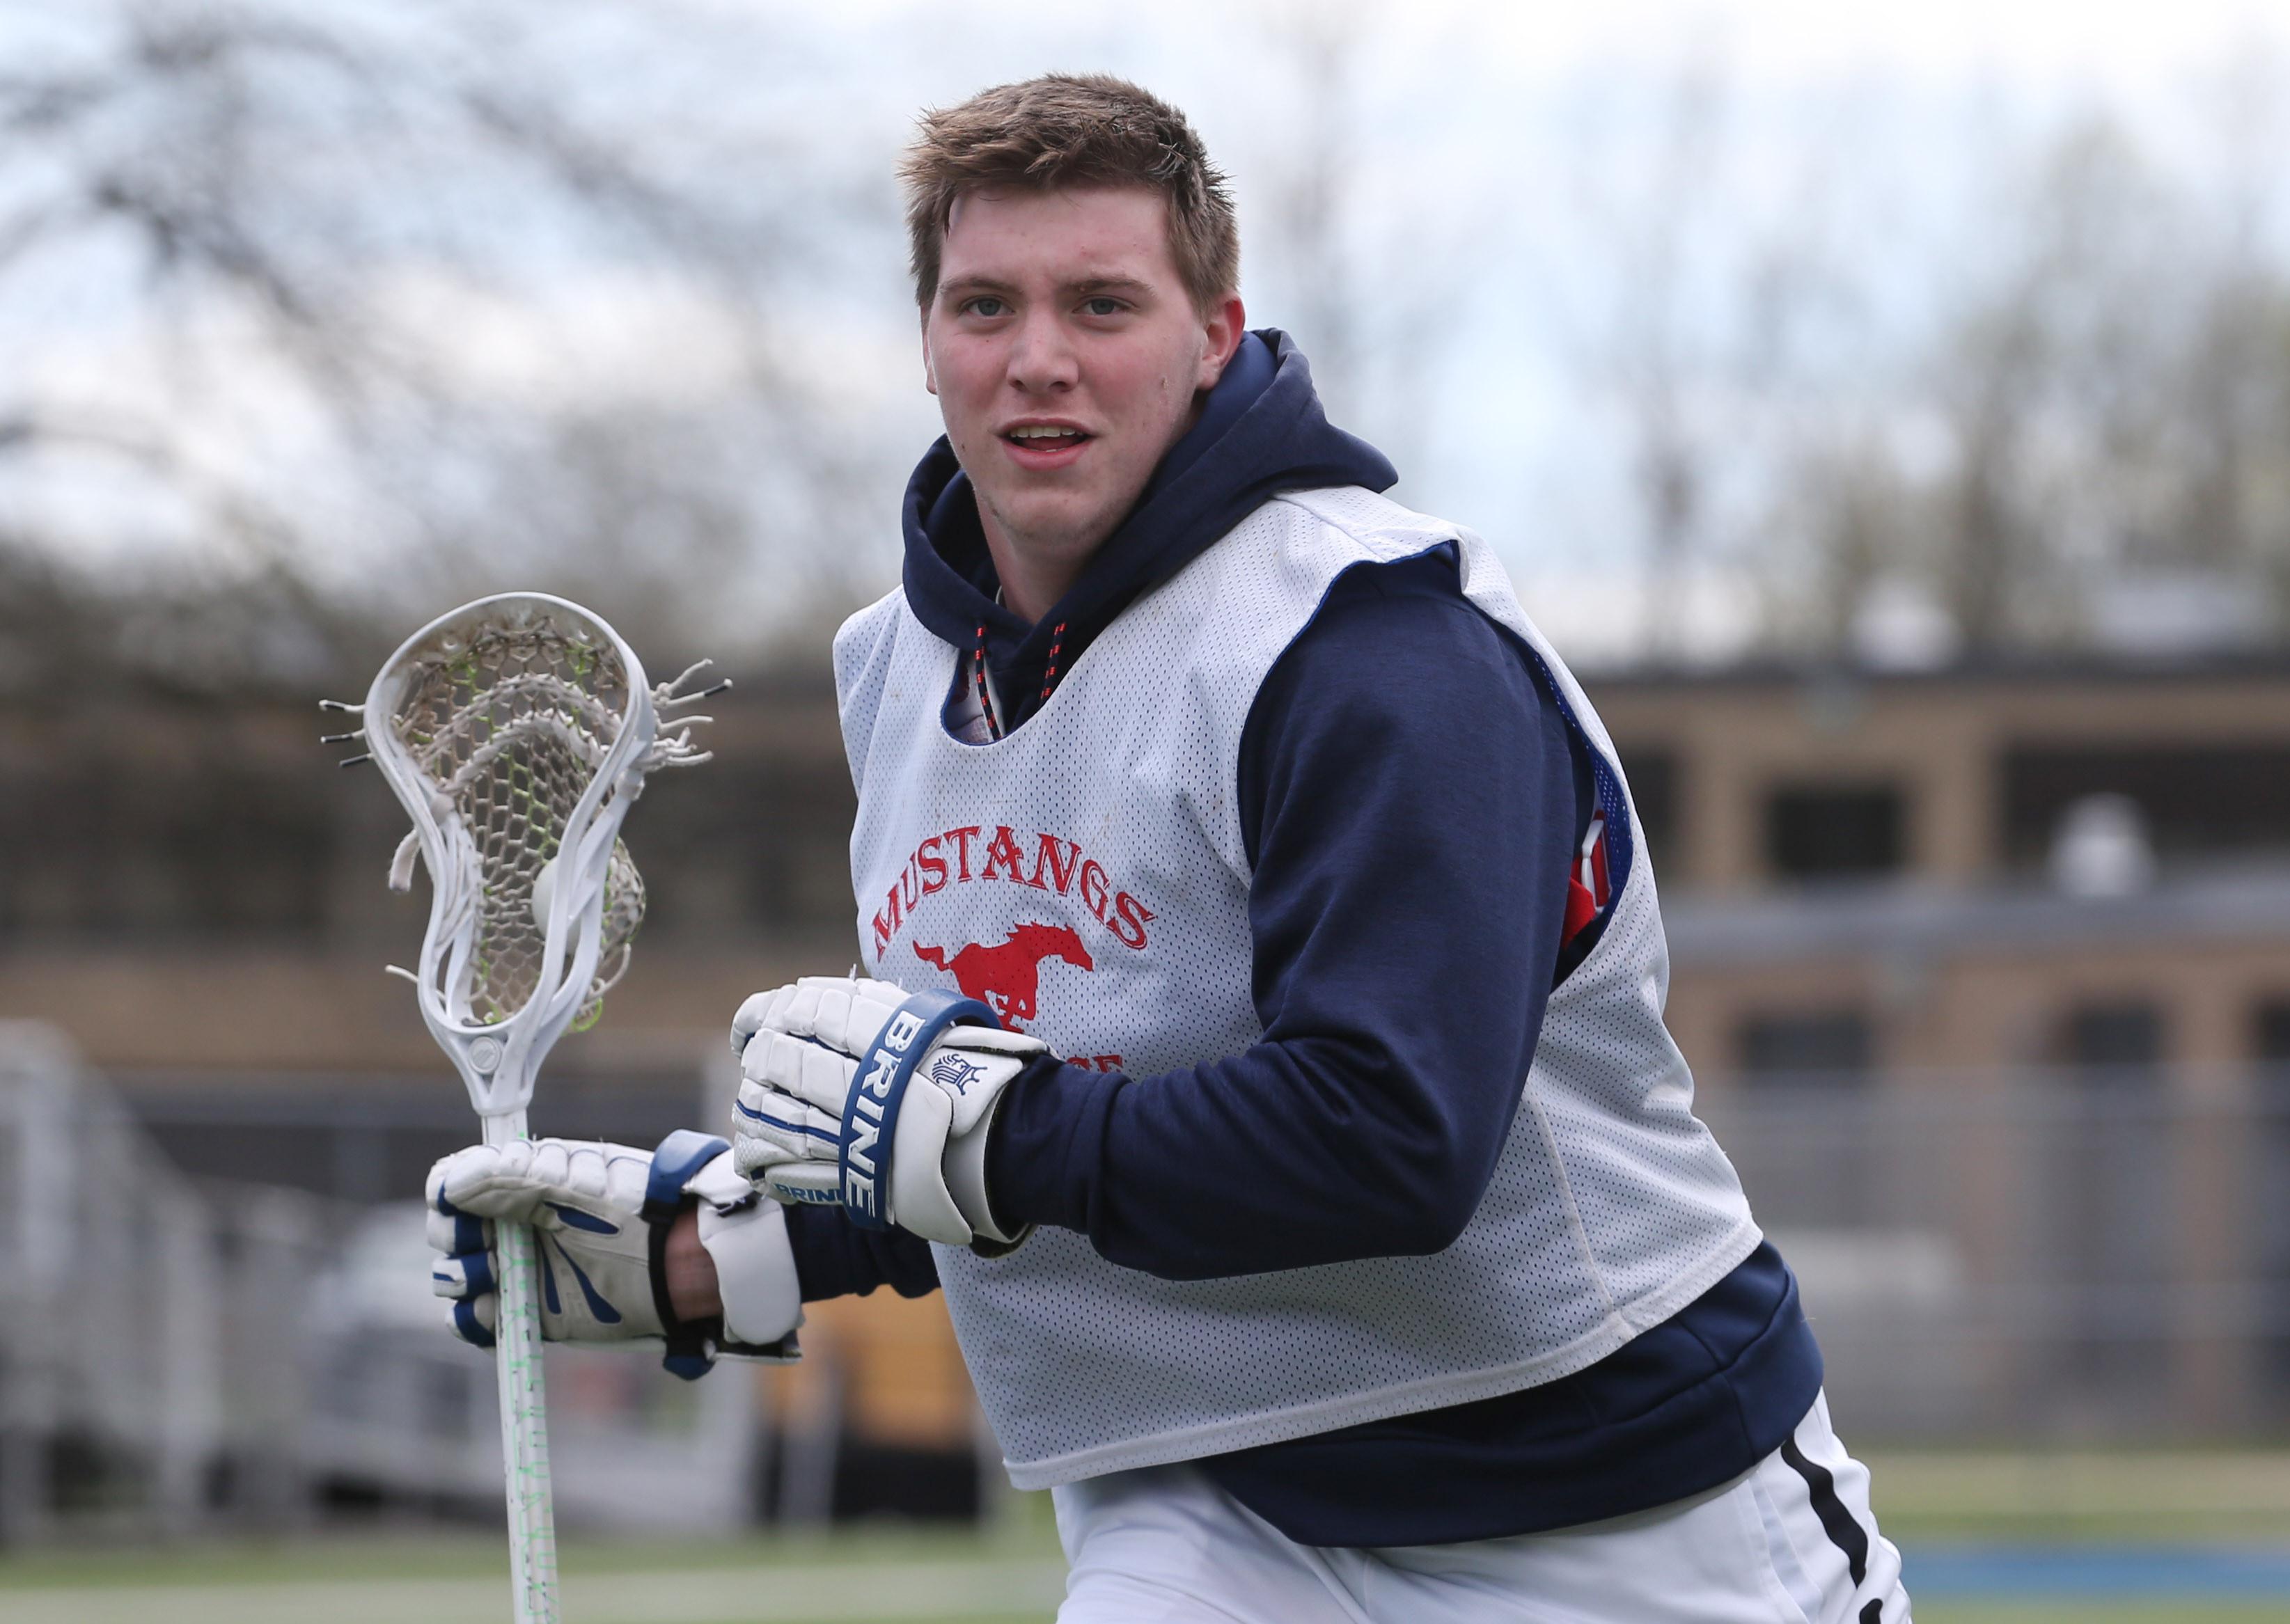 Jake Cotter of Medina lacrosse is the Prep Talk Male Athlete of the Week. (James P. McCoy/Buffalo News)